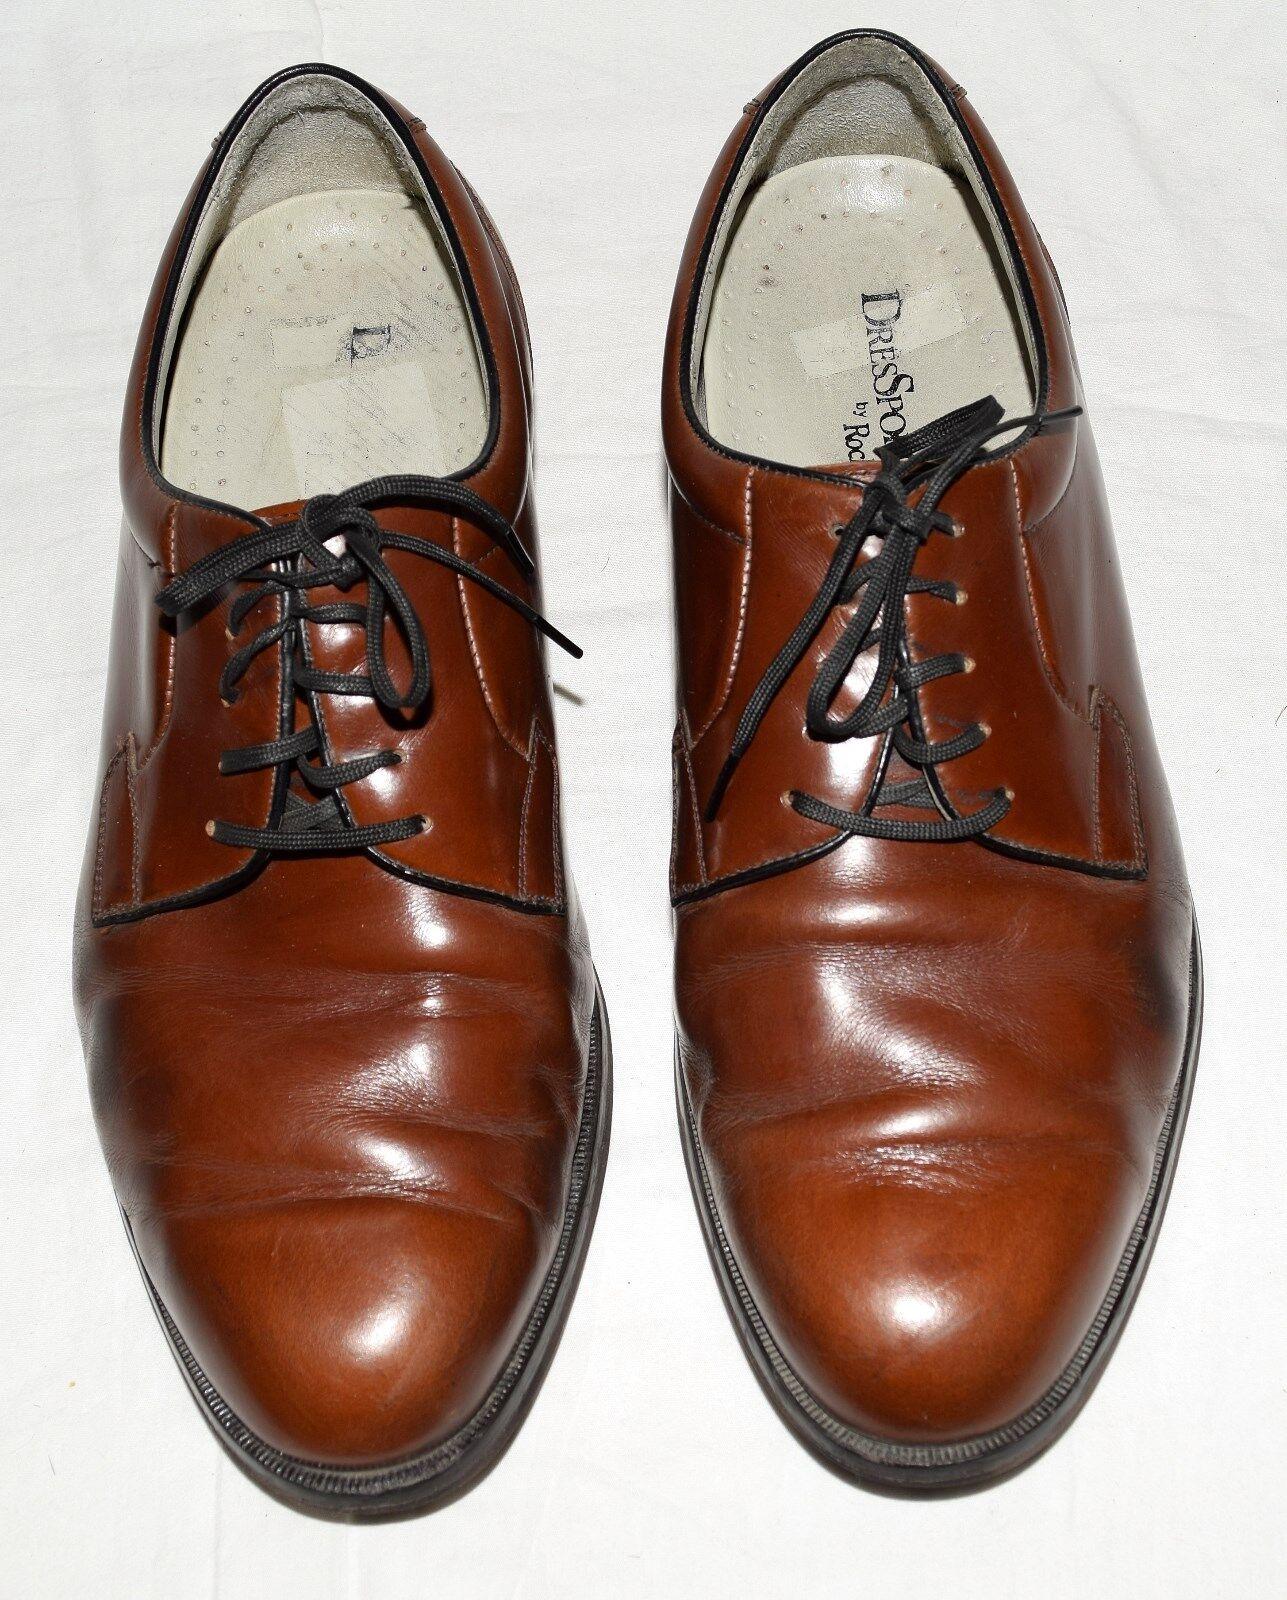 Vtg Rockport Dressport Brown Pelle Uomo Oxford Shoes Sz 9 W Made in Yugoslavia